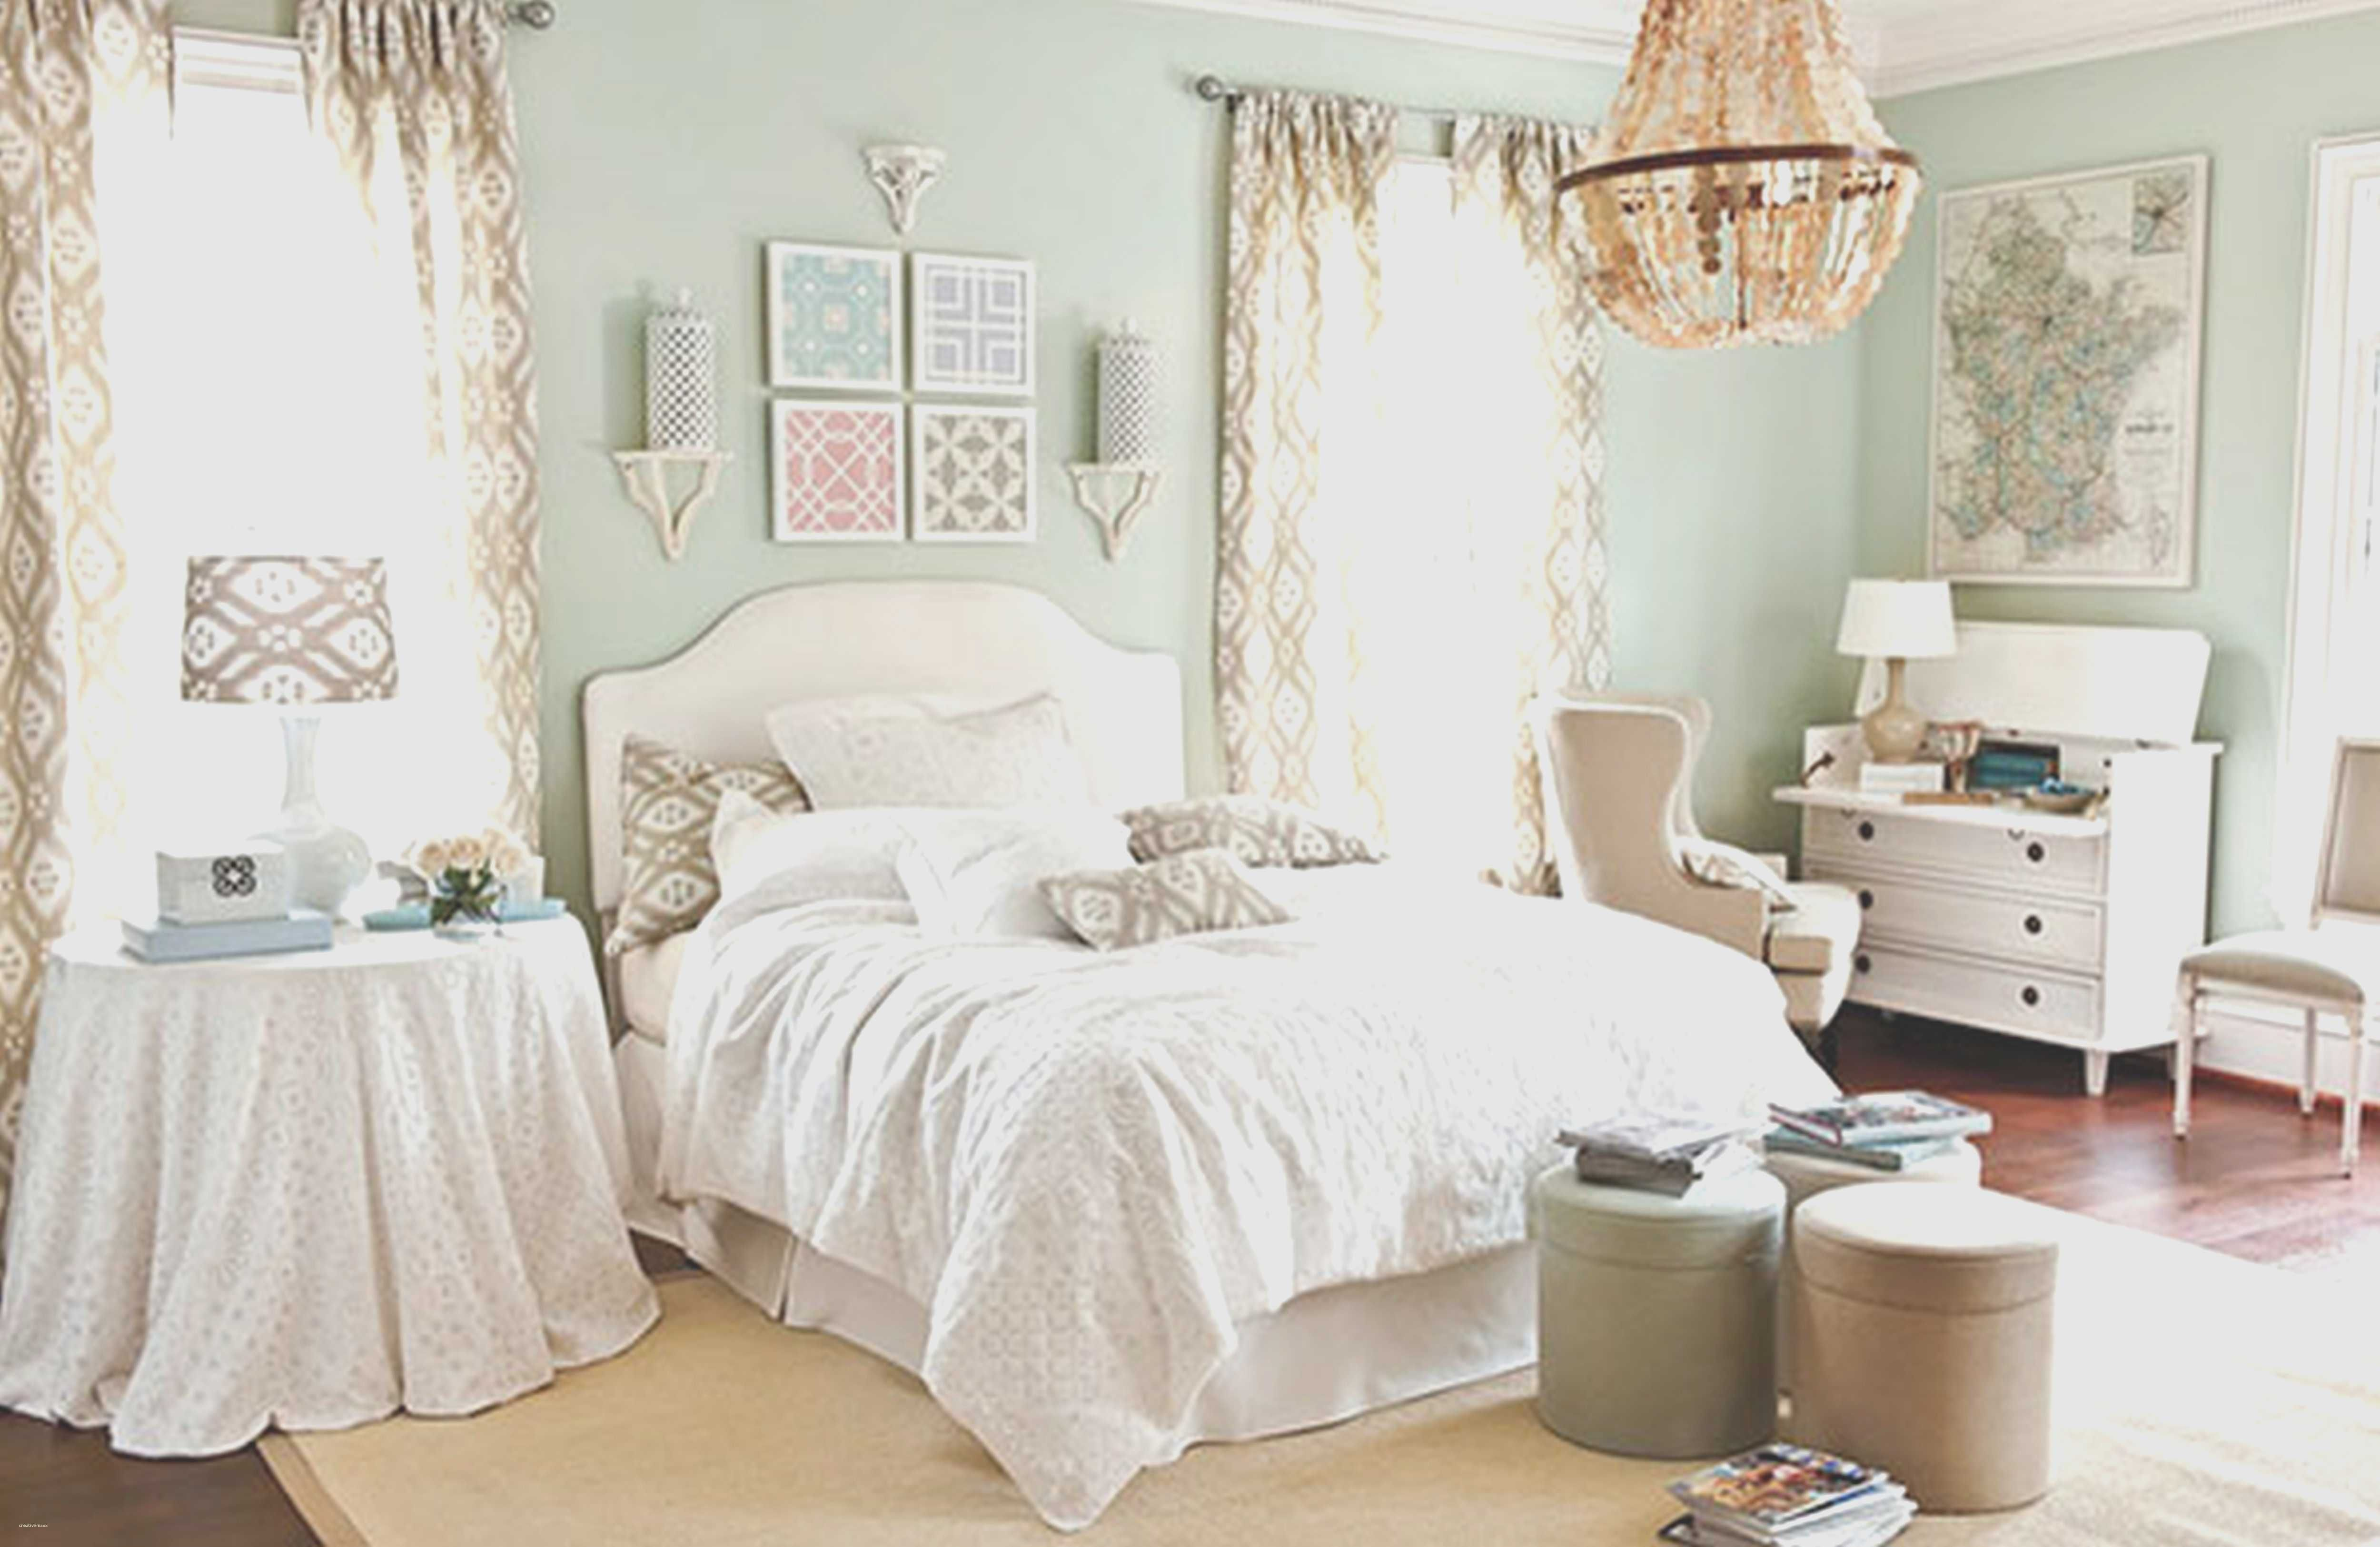 Bedroom Ideas For Teenage Girls Vintage   Beautiful Bedroom Ideas For Teenage  Girls Vintage, Chic Modern Teenage Girls Bedroom Ideas Teens Room Bedroom  ...